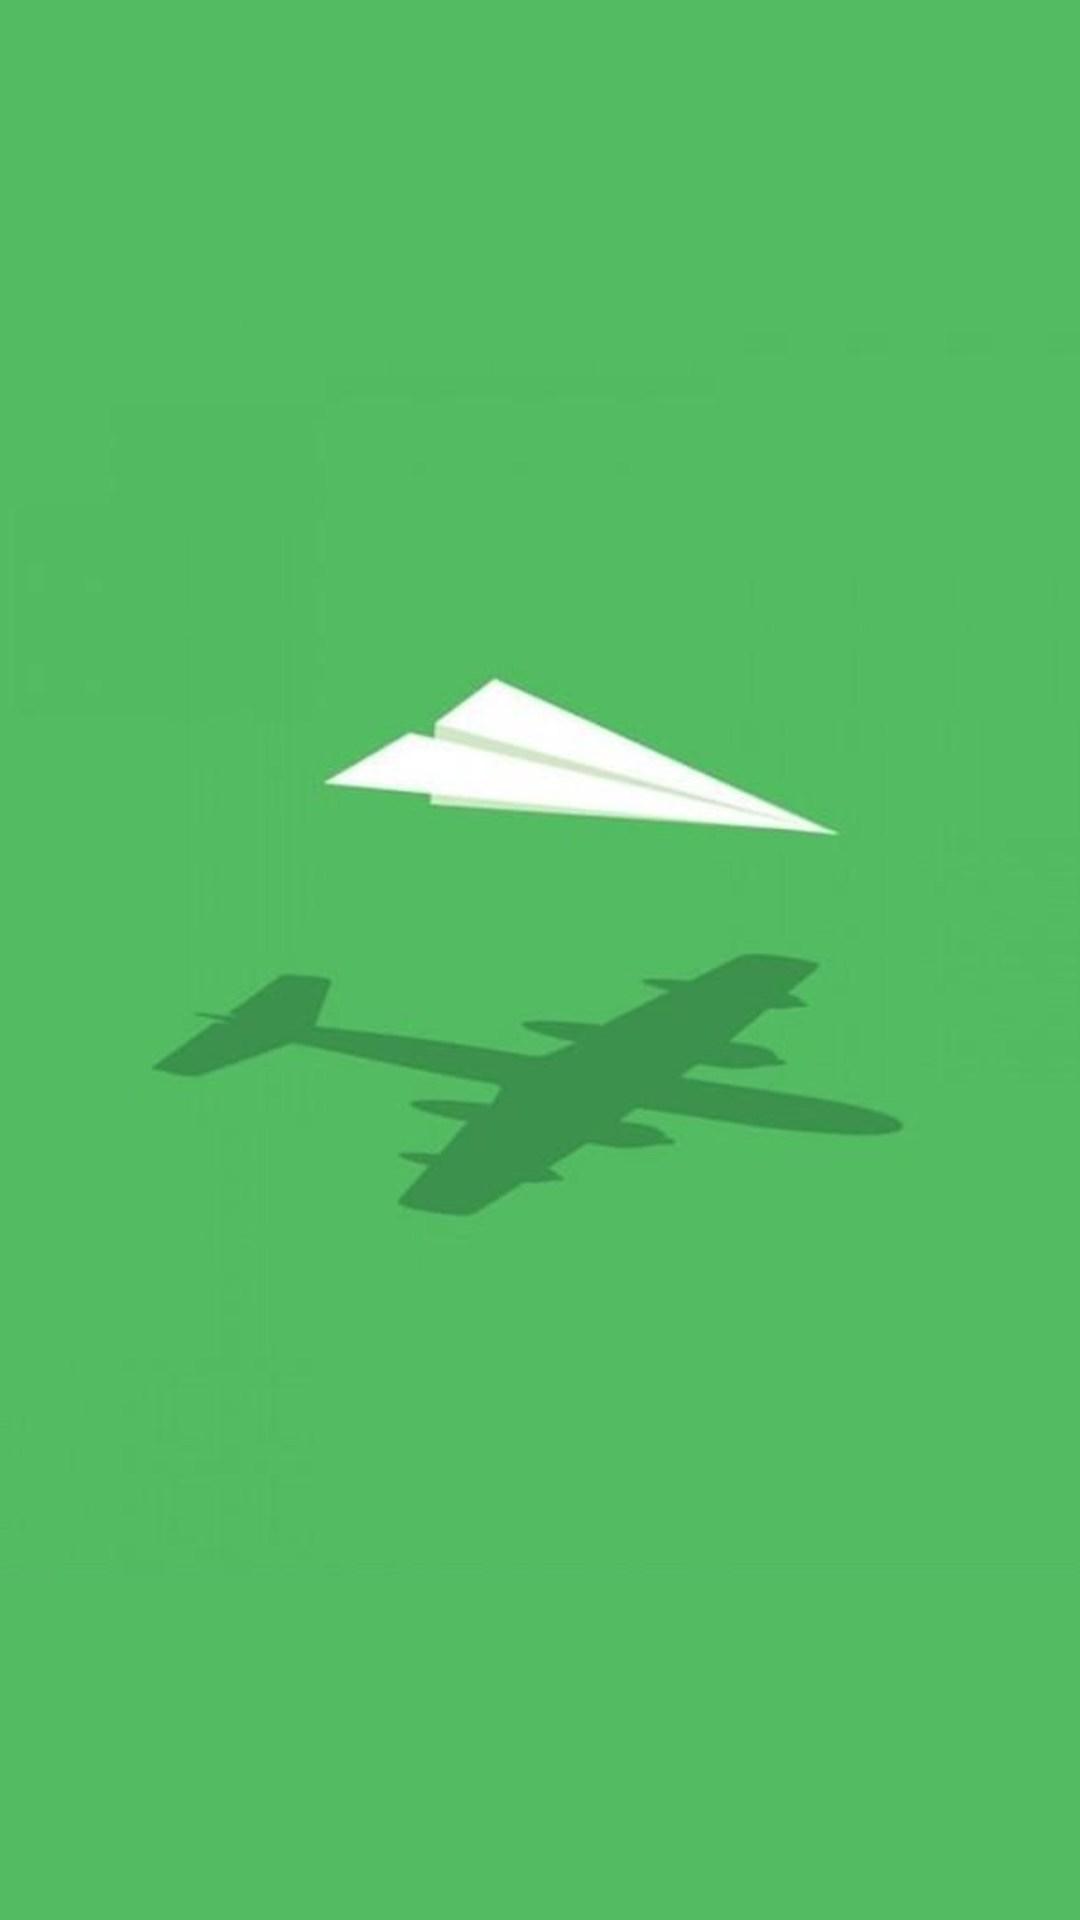 Paper Plane Minimalism Wide Wallpaper 1080x1920